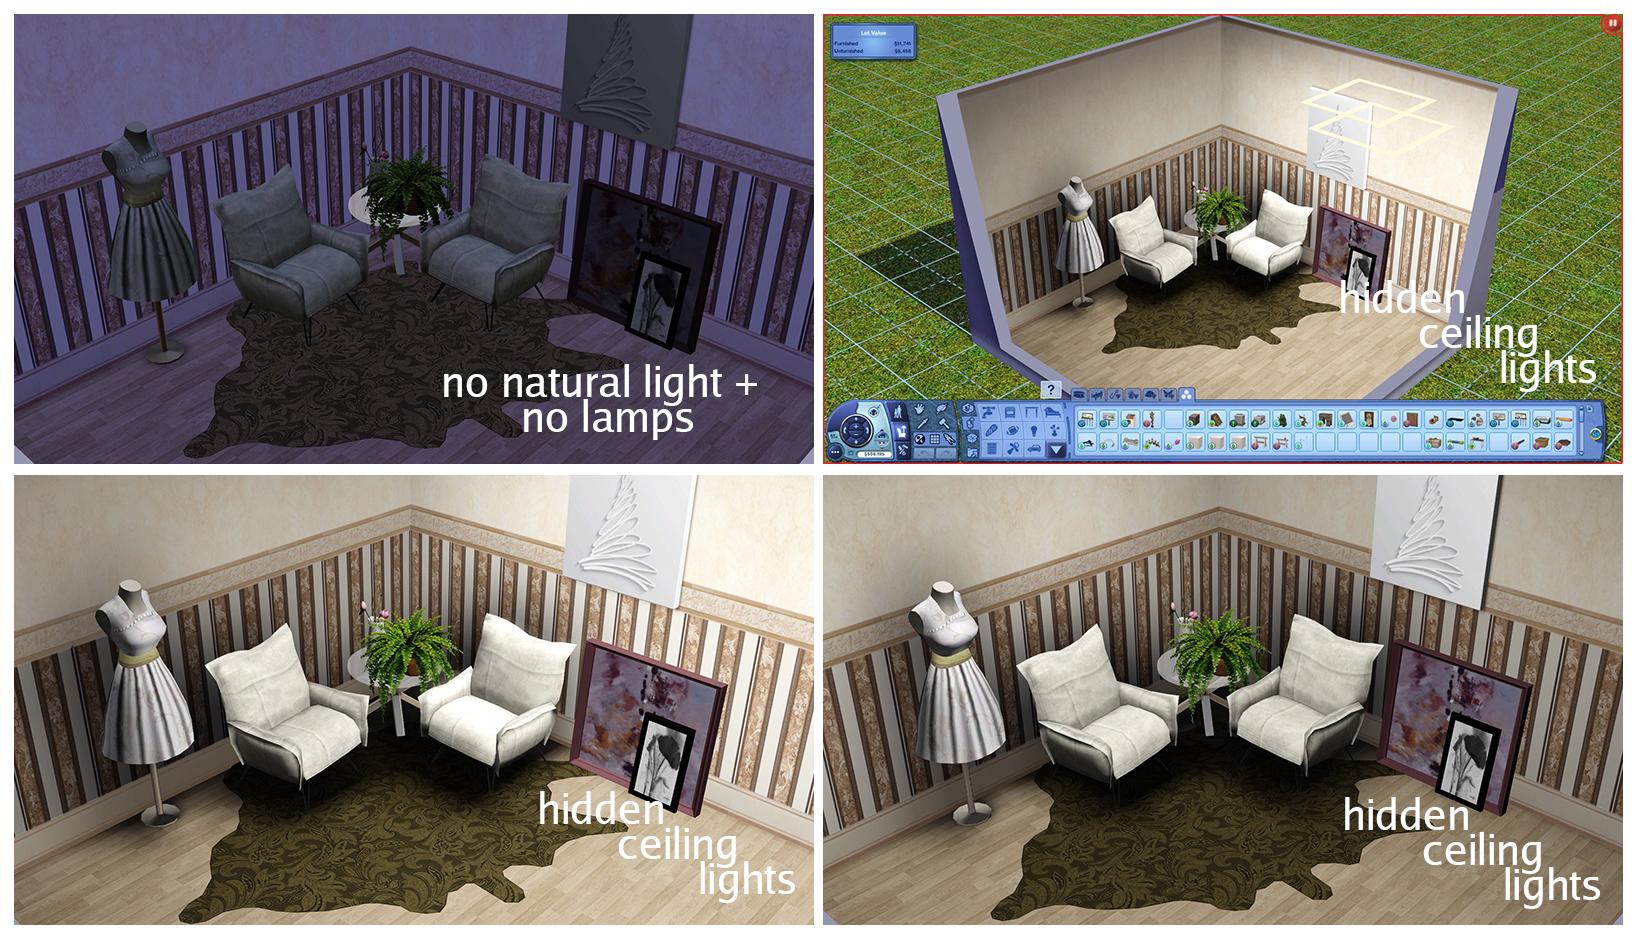 Steam Community Guide How To Lighten Dark Rooms